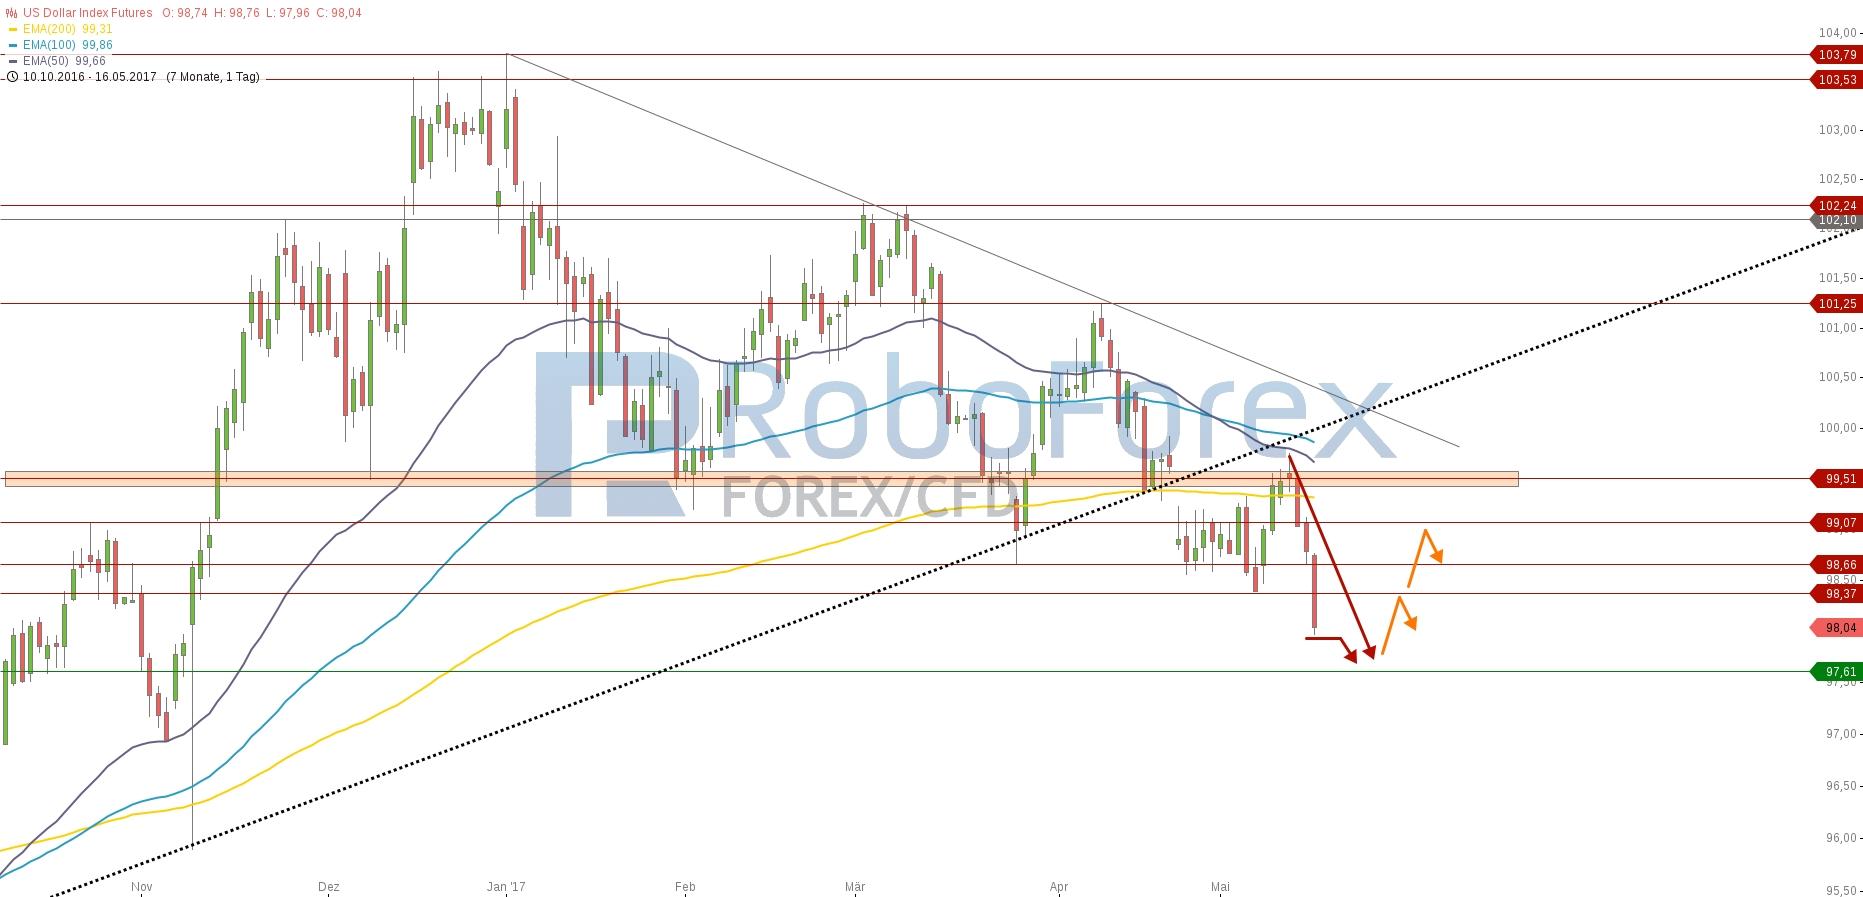 chart-16052017-2210-usdollarindexfutures-roboforex.jpg